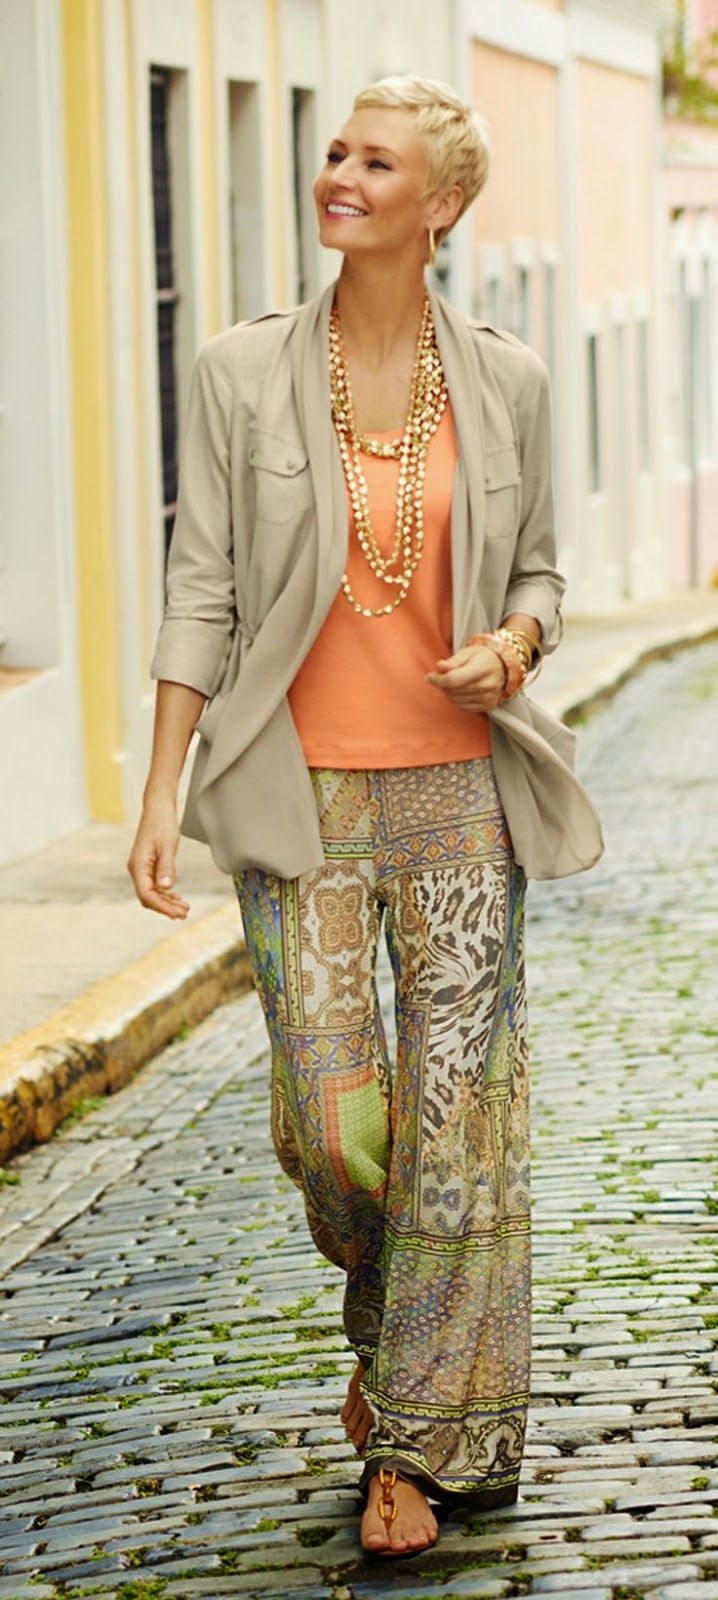 Outfit Inspiration Summer fashion | Boho fashion over 40 ...